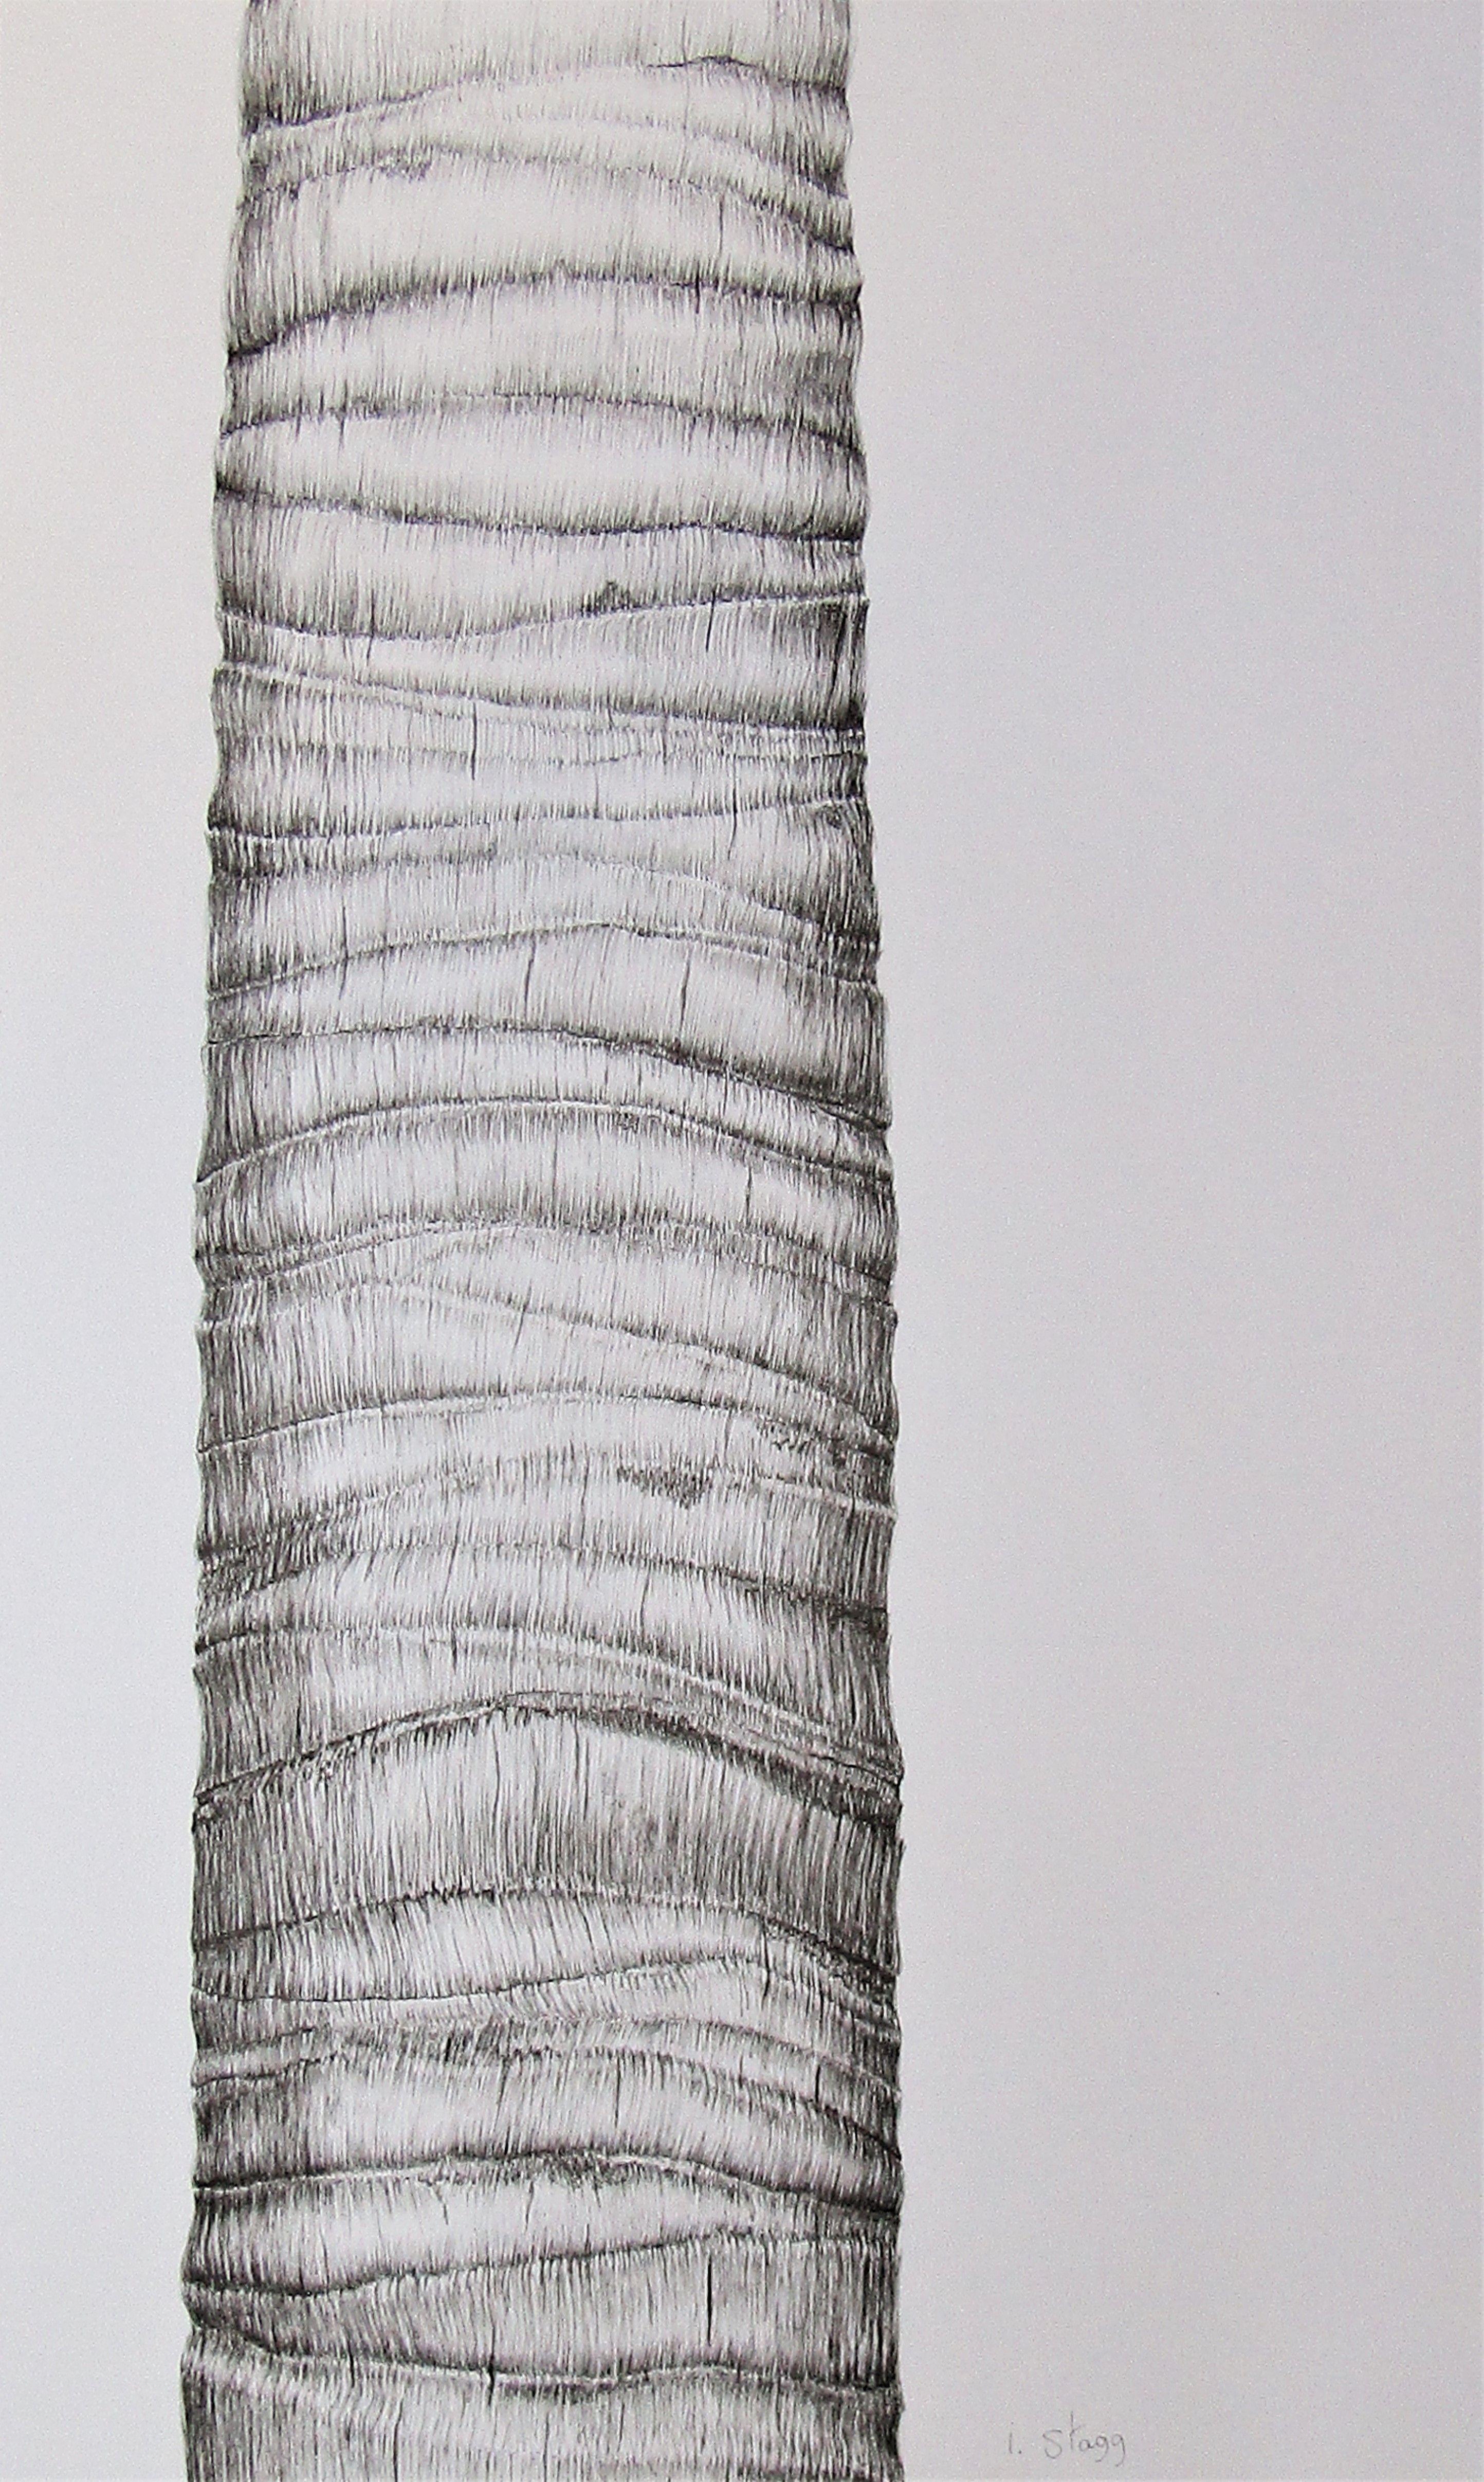 [+] Palm Tree Bark